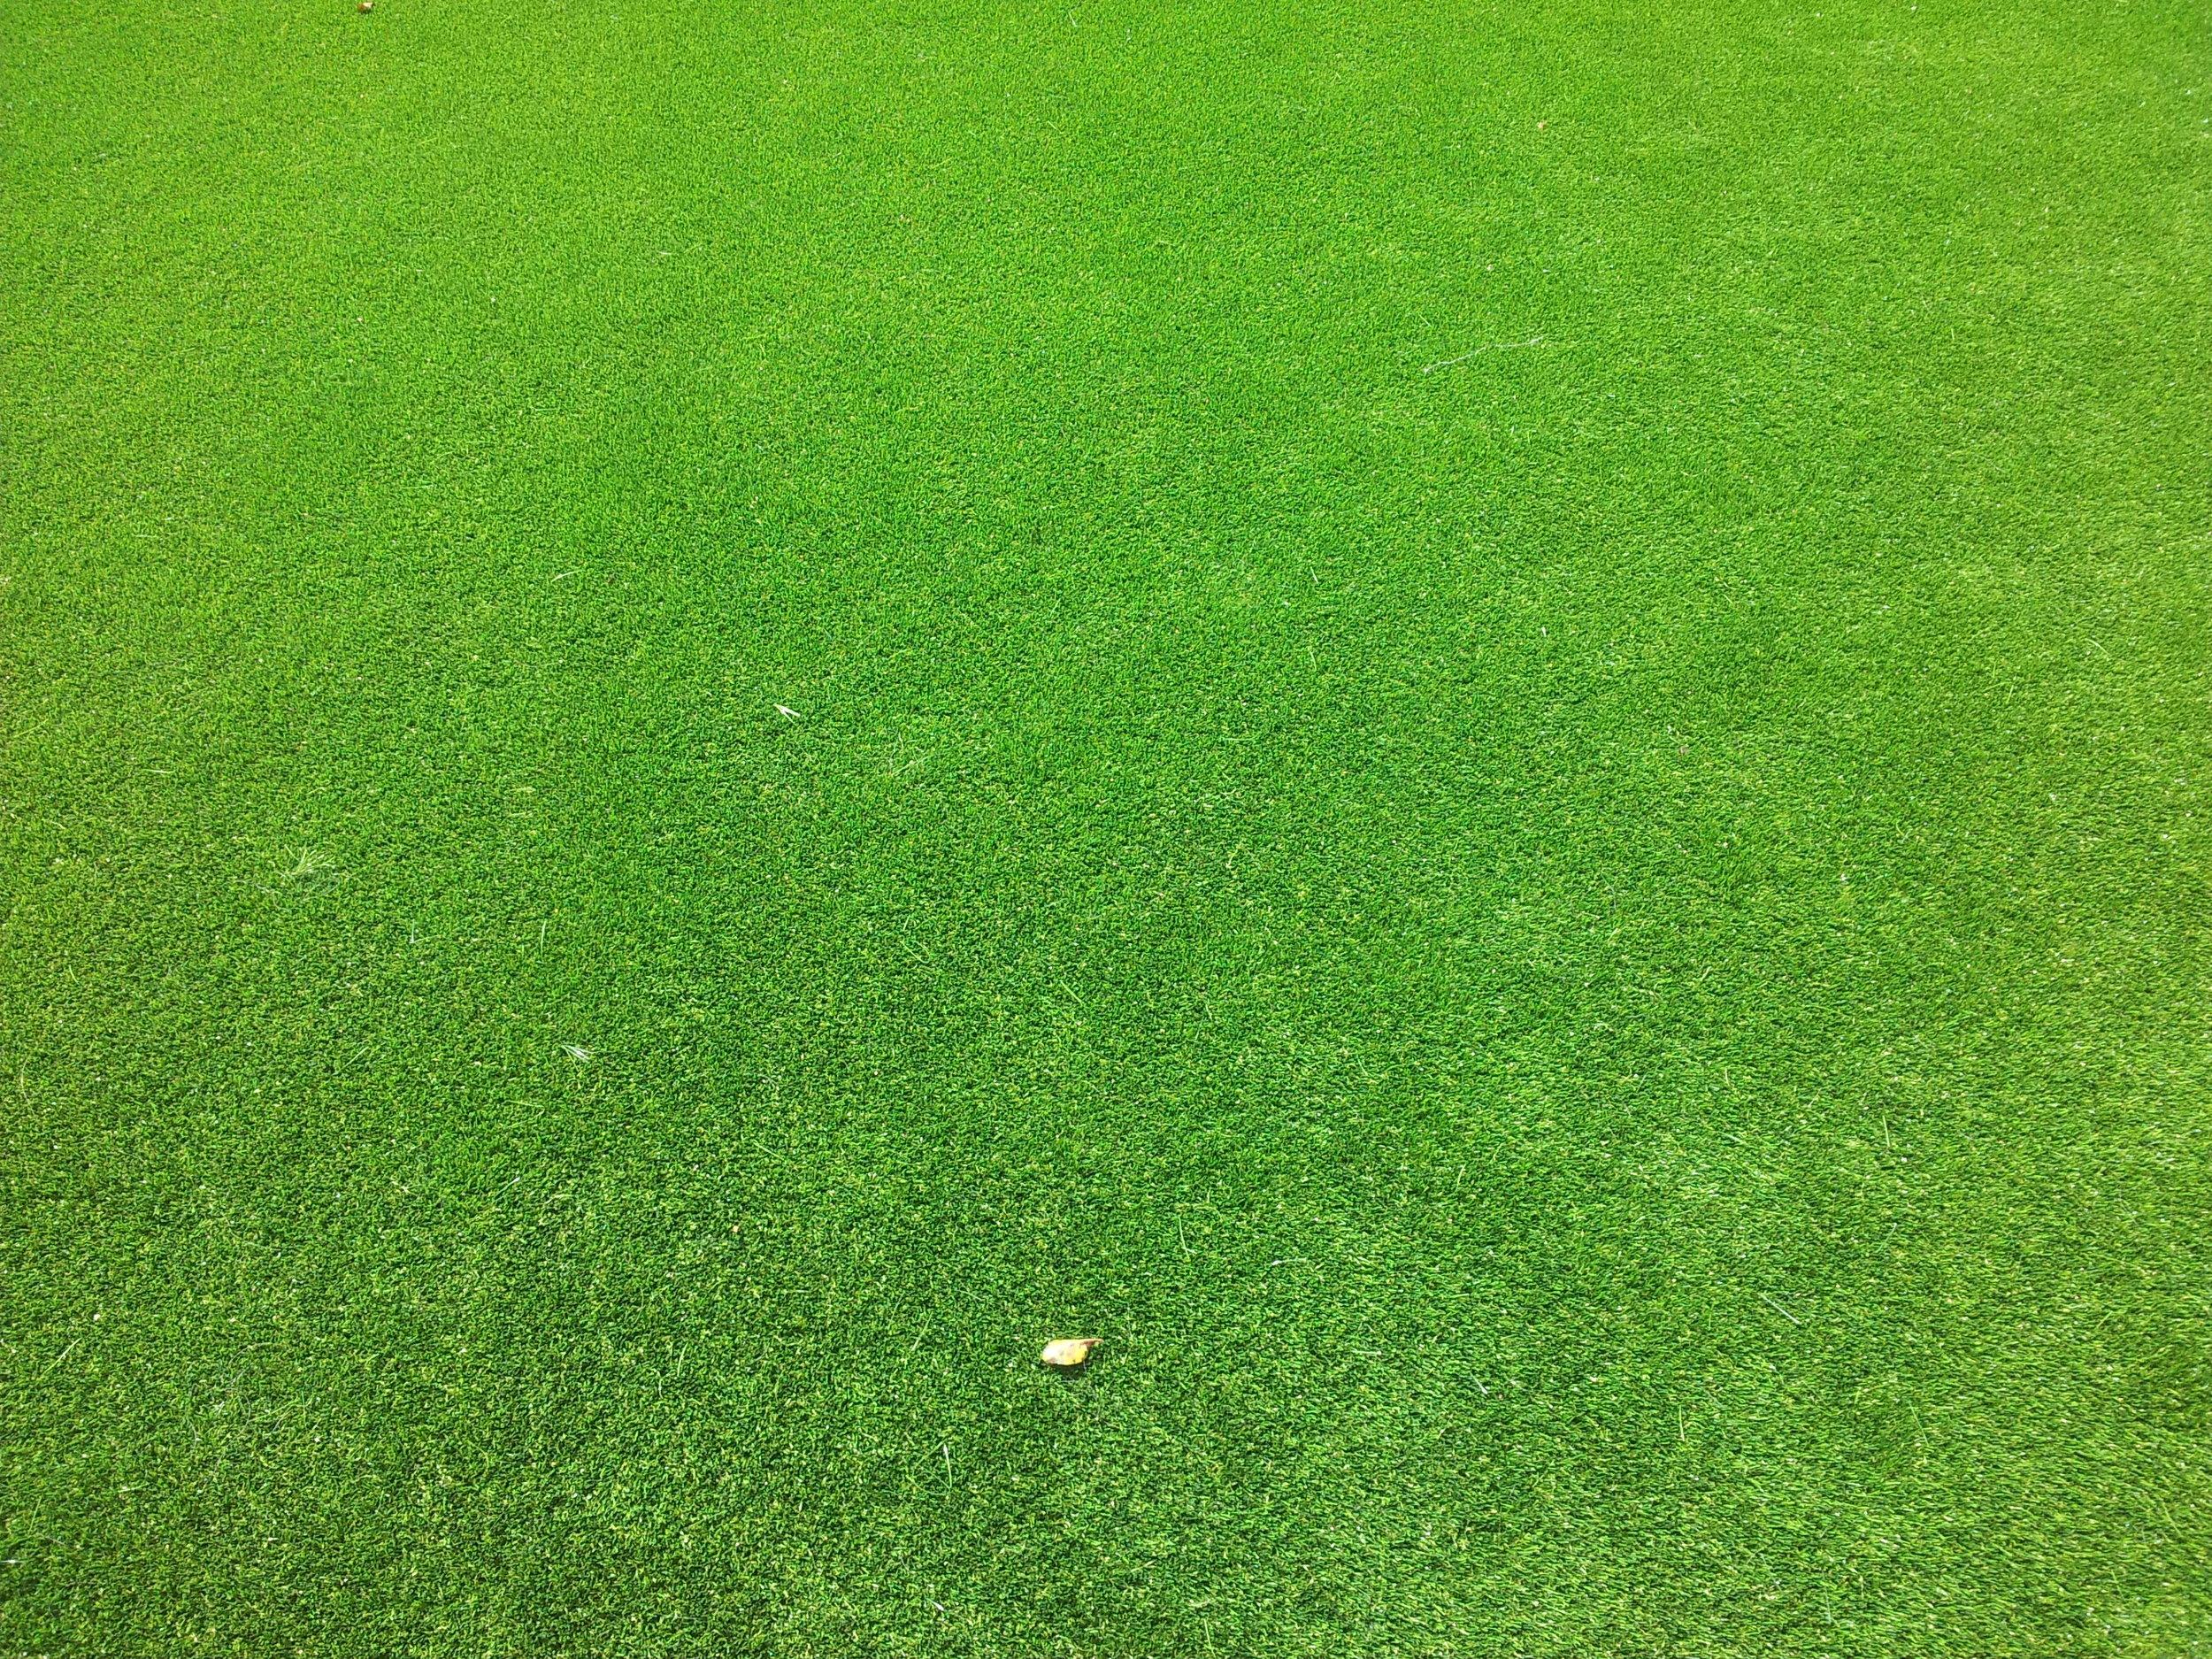 artificial astro turf lawn